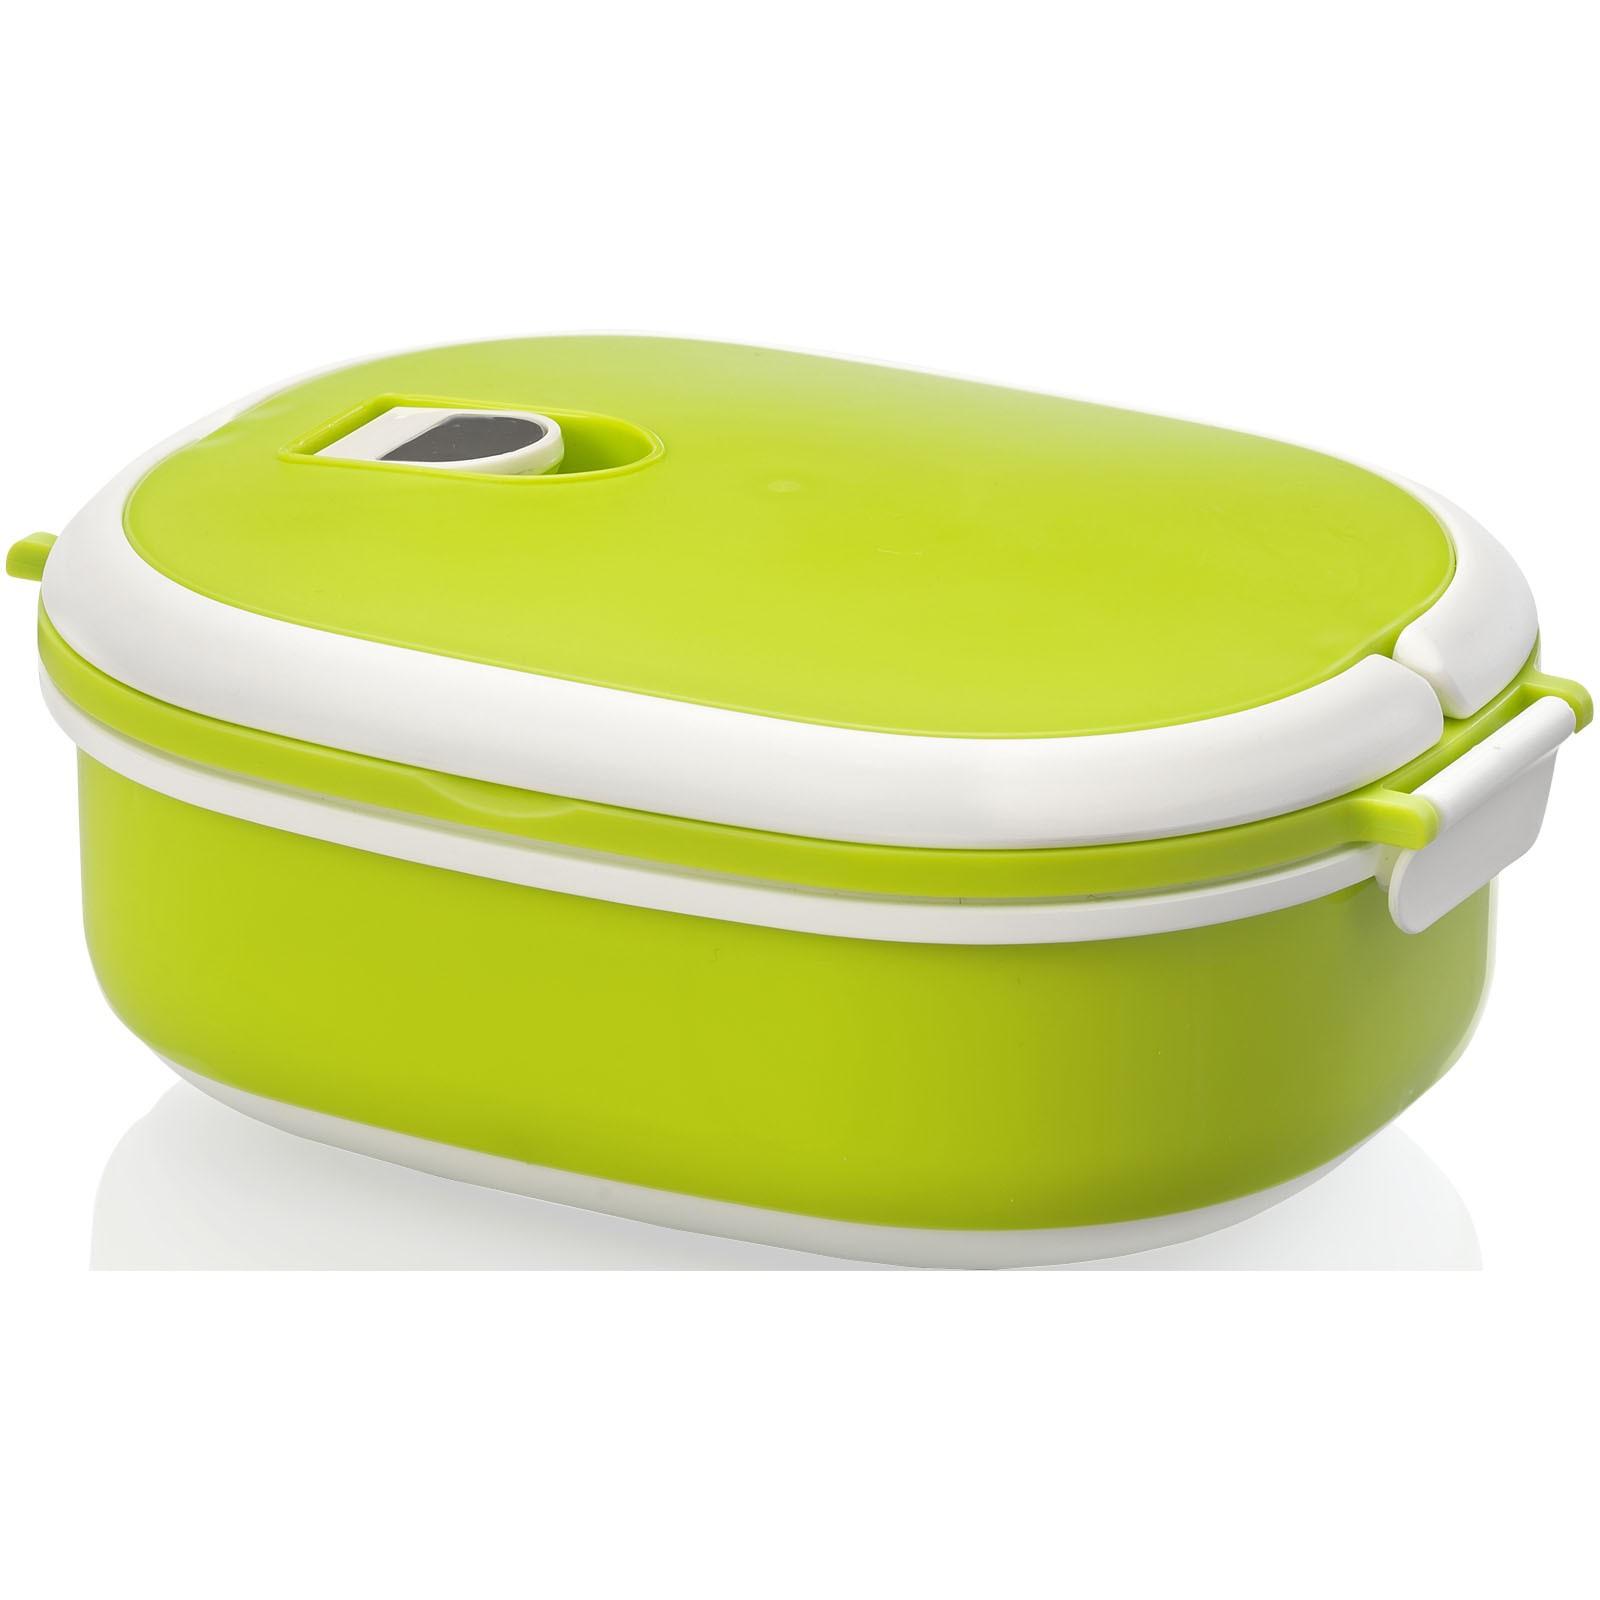 Spiga 750 ml lunch box - Lime / White